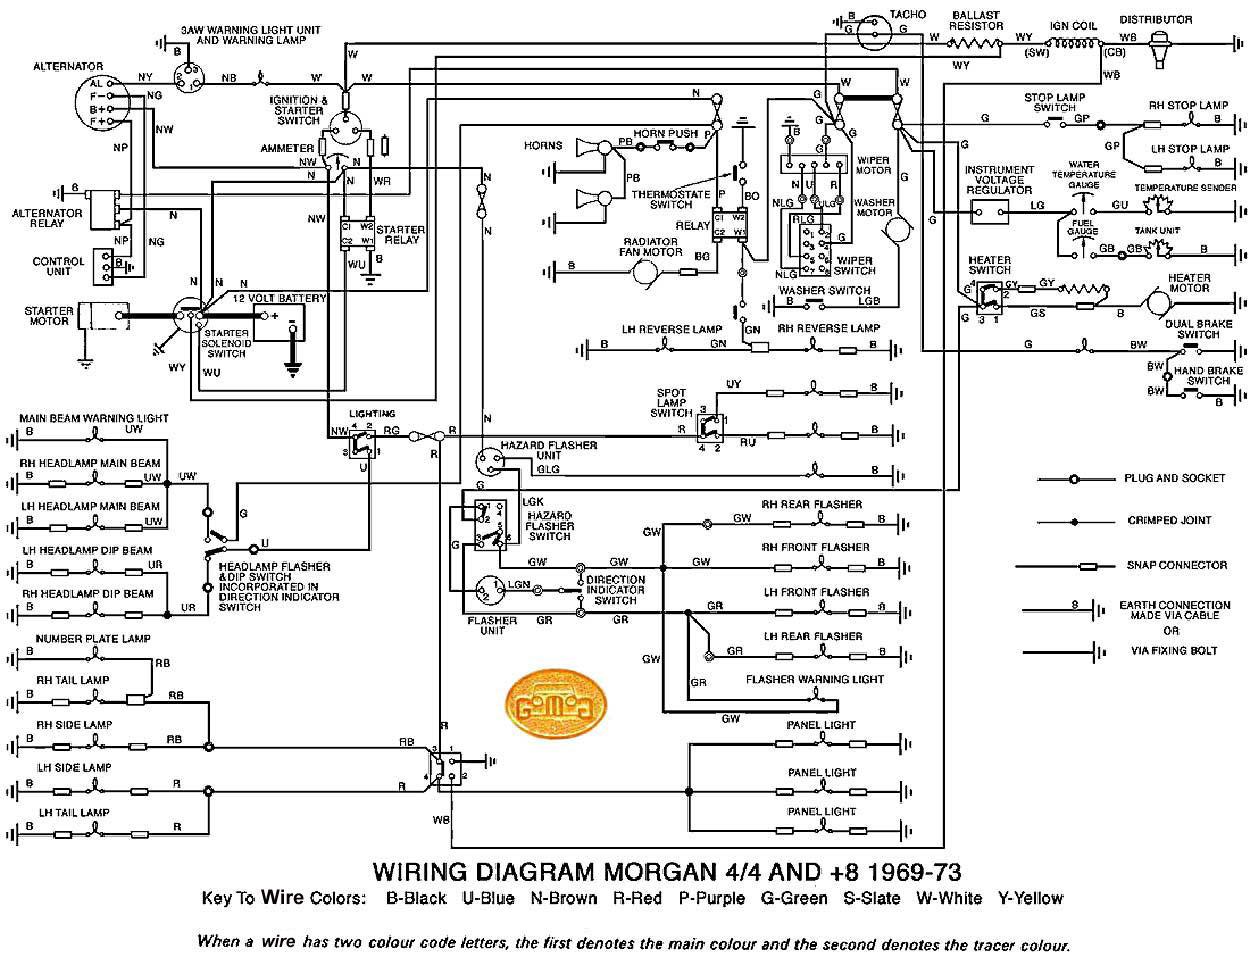 morgan spa diagram schematic diagramecosmart 11 spa wiring schematic  ecosmart eco 27 electric tankless morgan spa